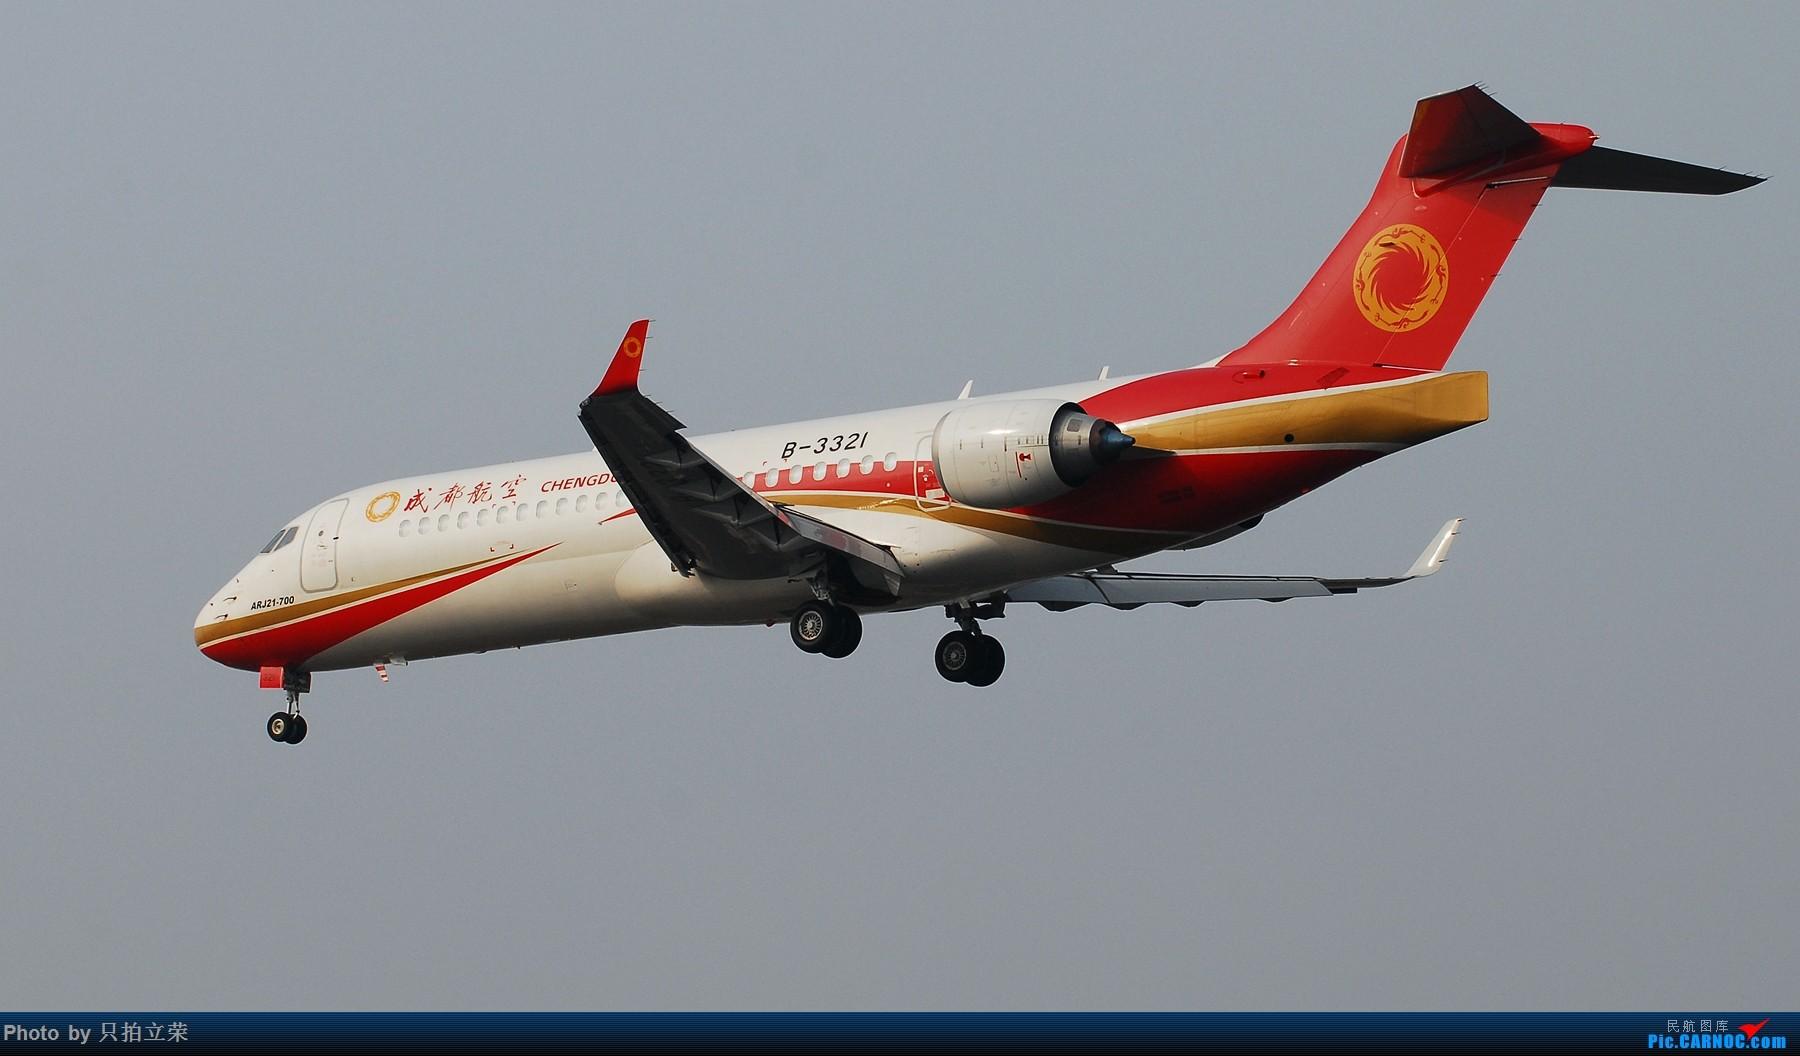 Re:[原创]湖南飞友会之,阿娇终于来长沙! COMAC ARJ21-700 B-3321 中国长沙黄花国际机场